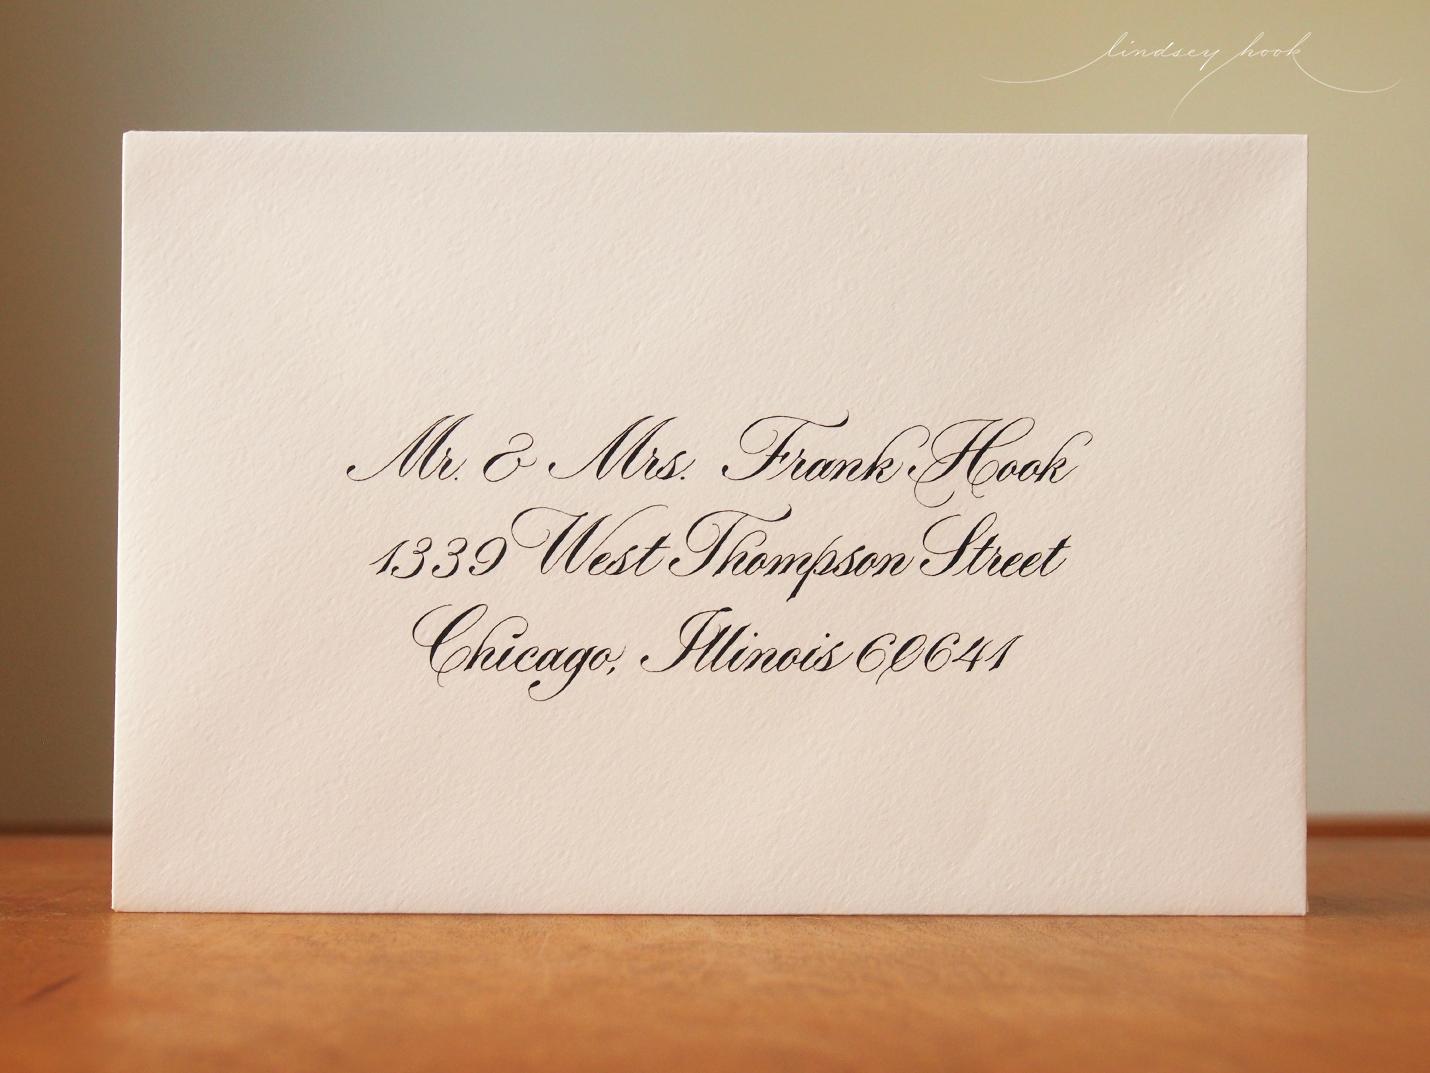 Parfumerie (Text) Envelope